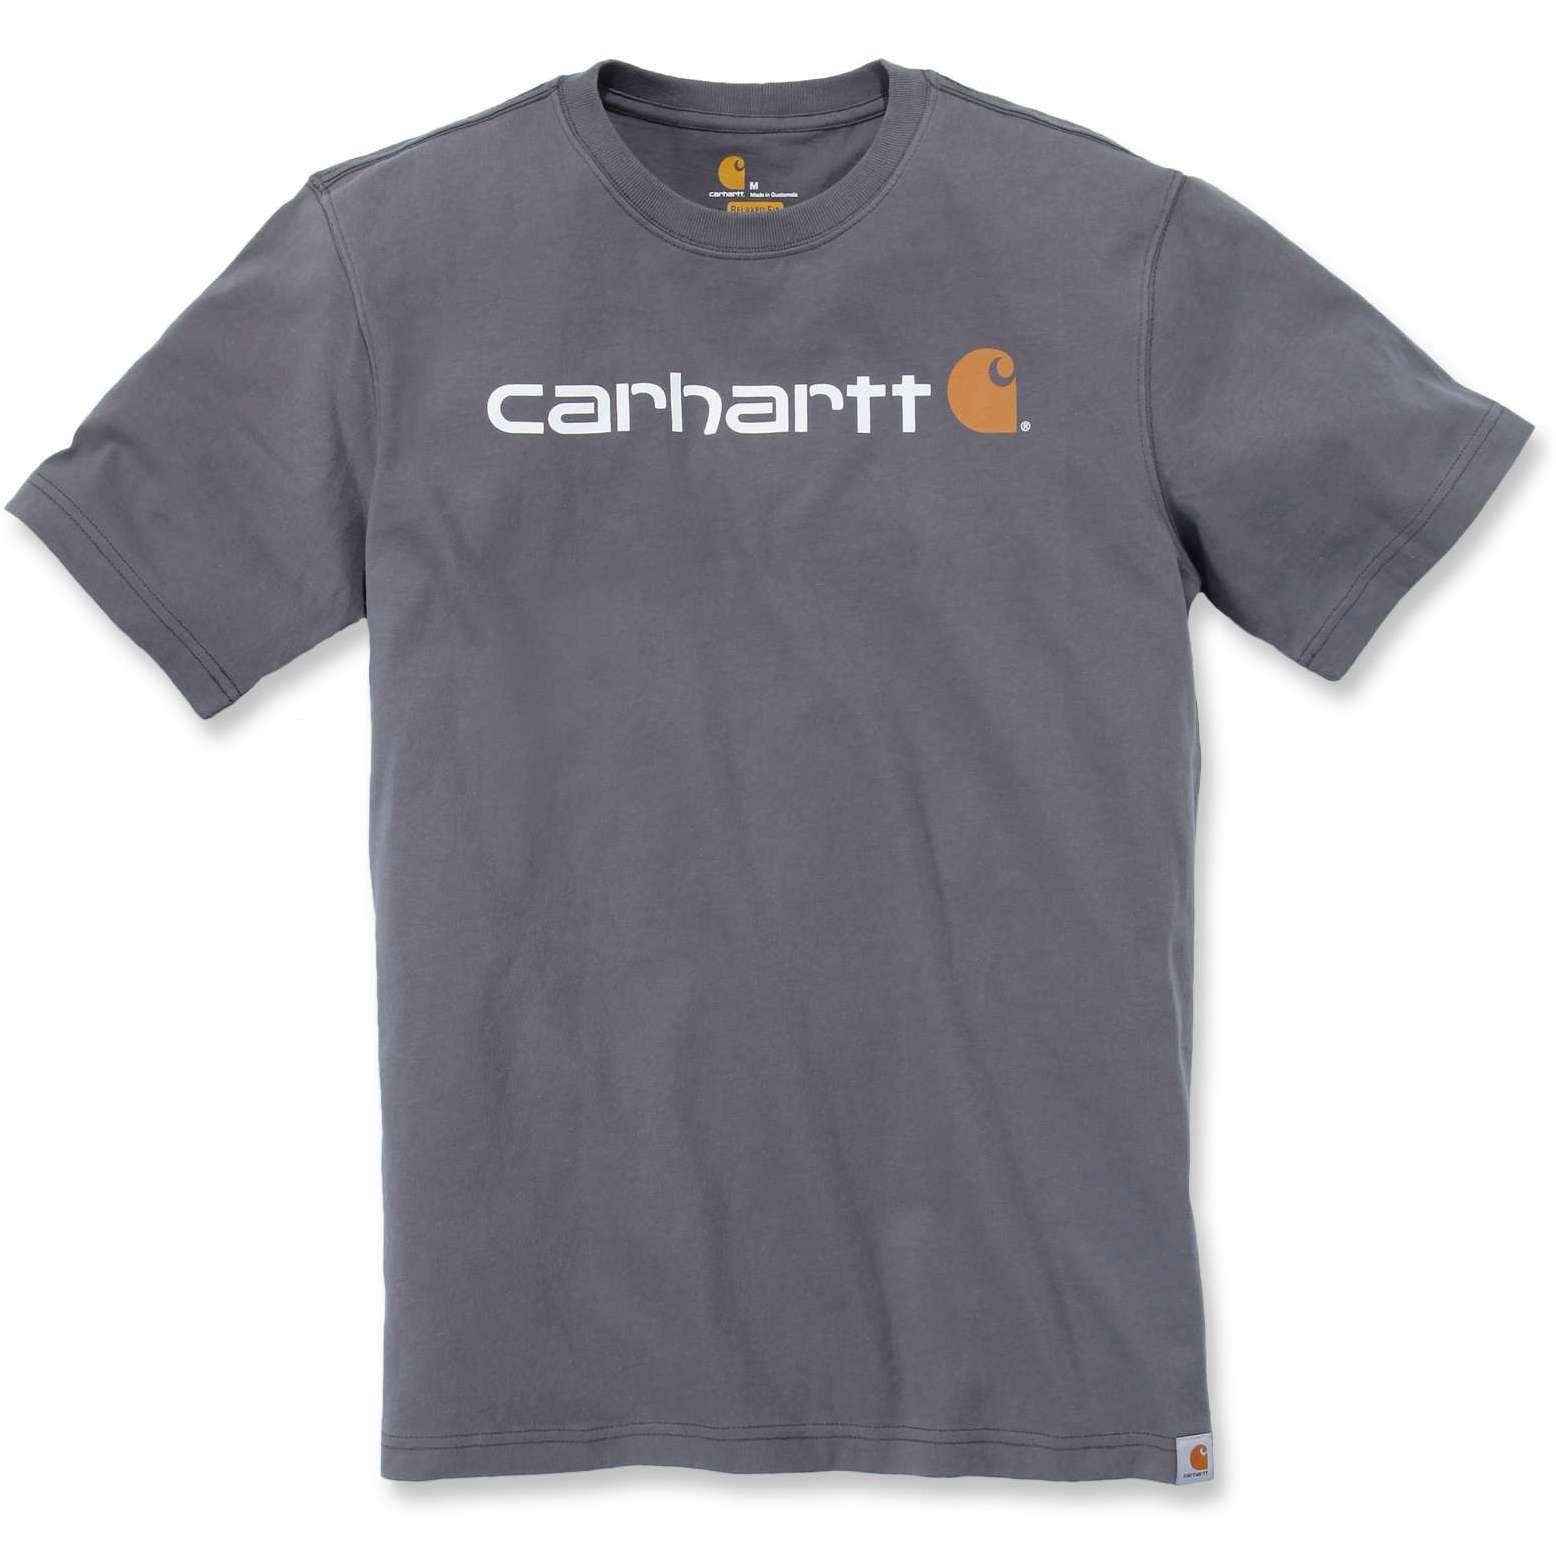 Футболка Carhartt Core Logo T-Shirt S/S - 103361 (Charcoal, M)